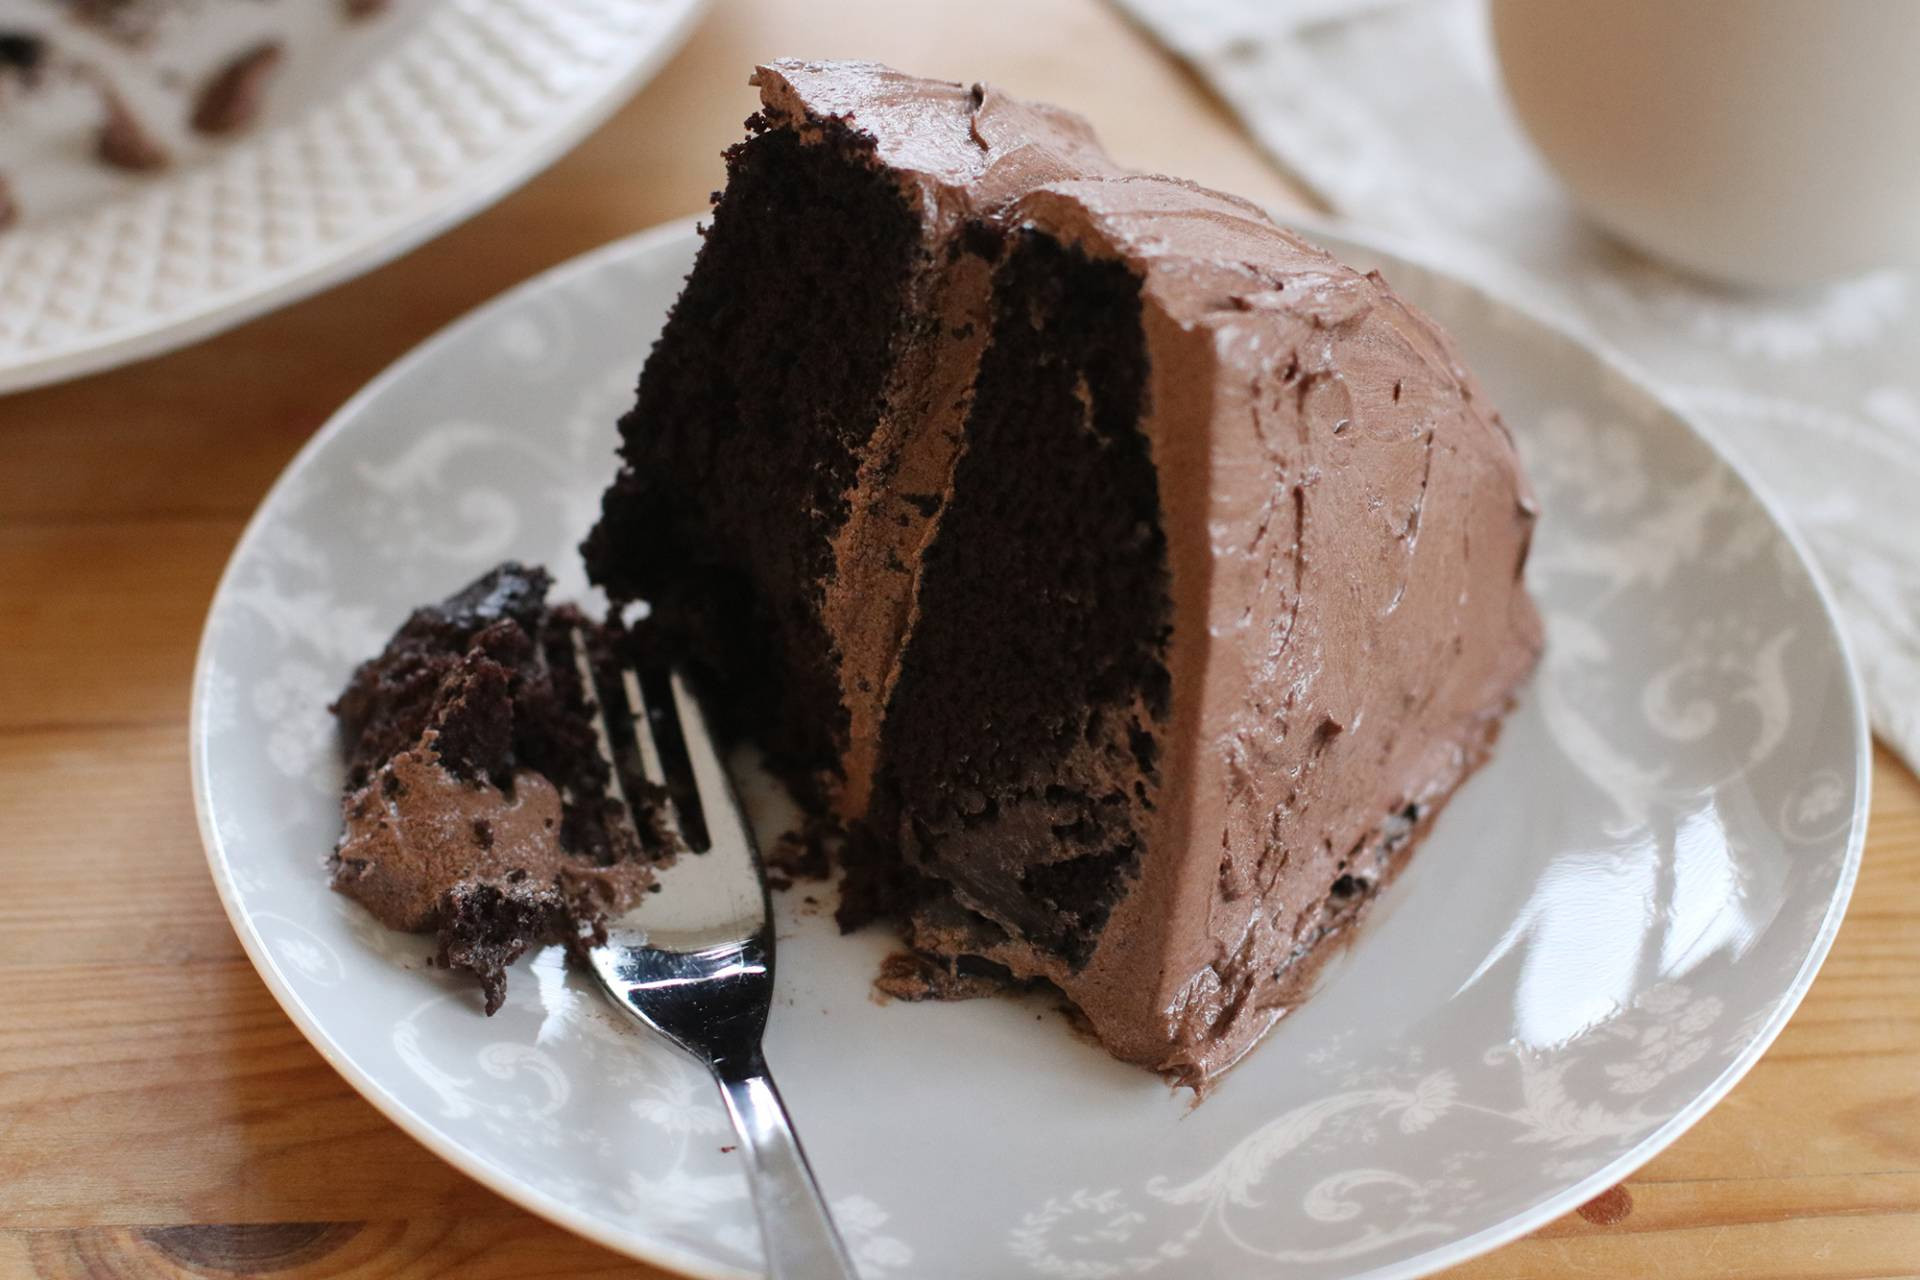 Gluten Free Chocolate Cake Recipe  My Wickedly Chocolatey Gluten Free Chocolate Cake Recipe